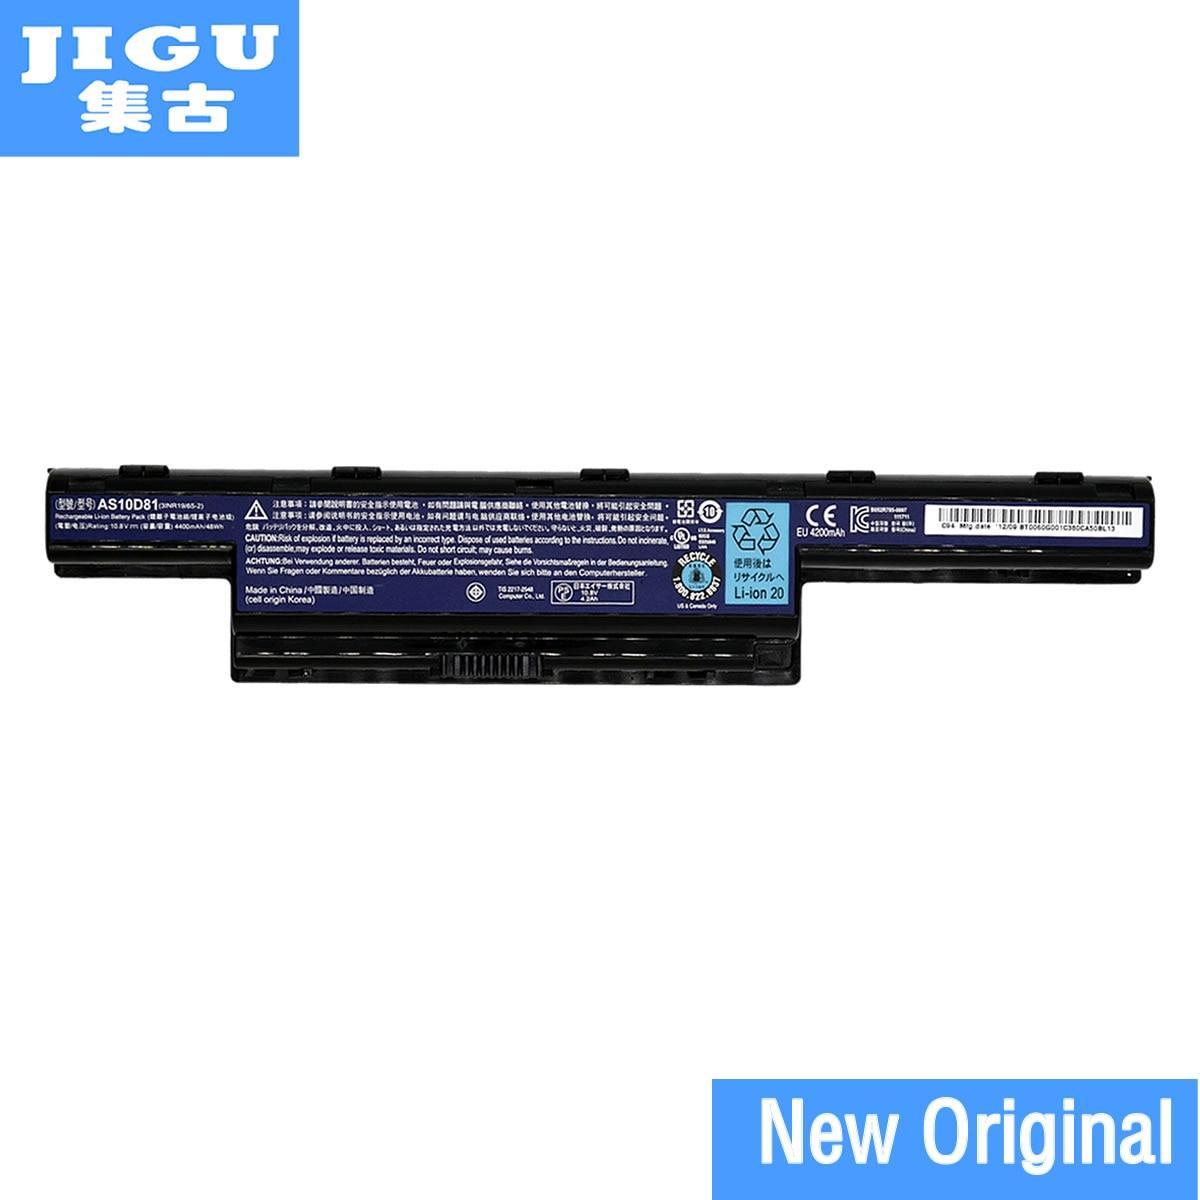 JIGU AS10D31 AS10D3E AS10D41 AS10D51 AS10D56 AS10D61 AS10D71 AS10D73 AS10D75 AS10D81 batería Original del ordenador portátil para ACER